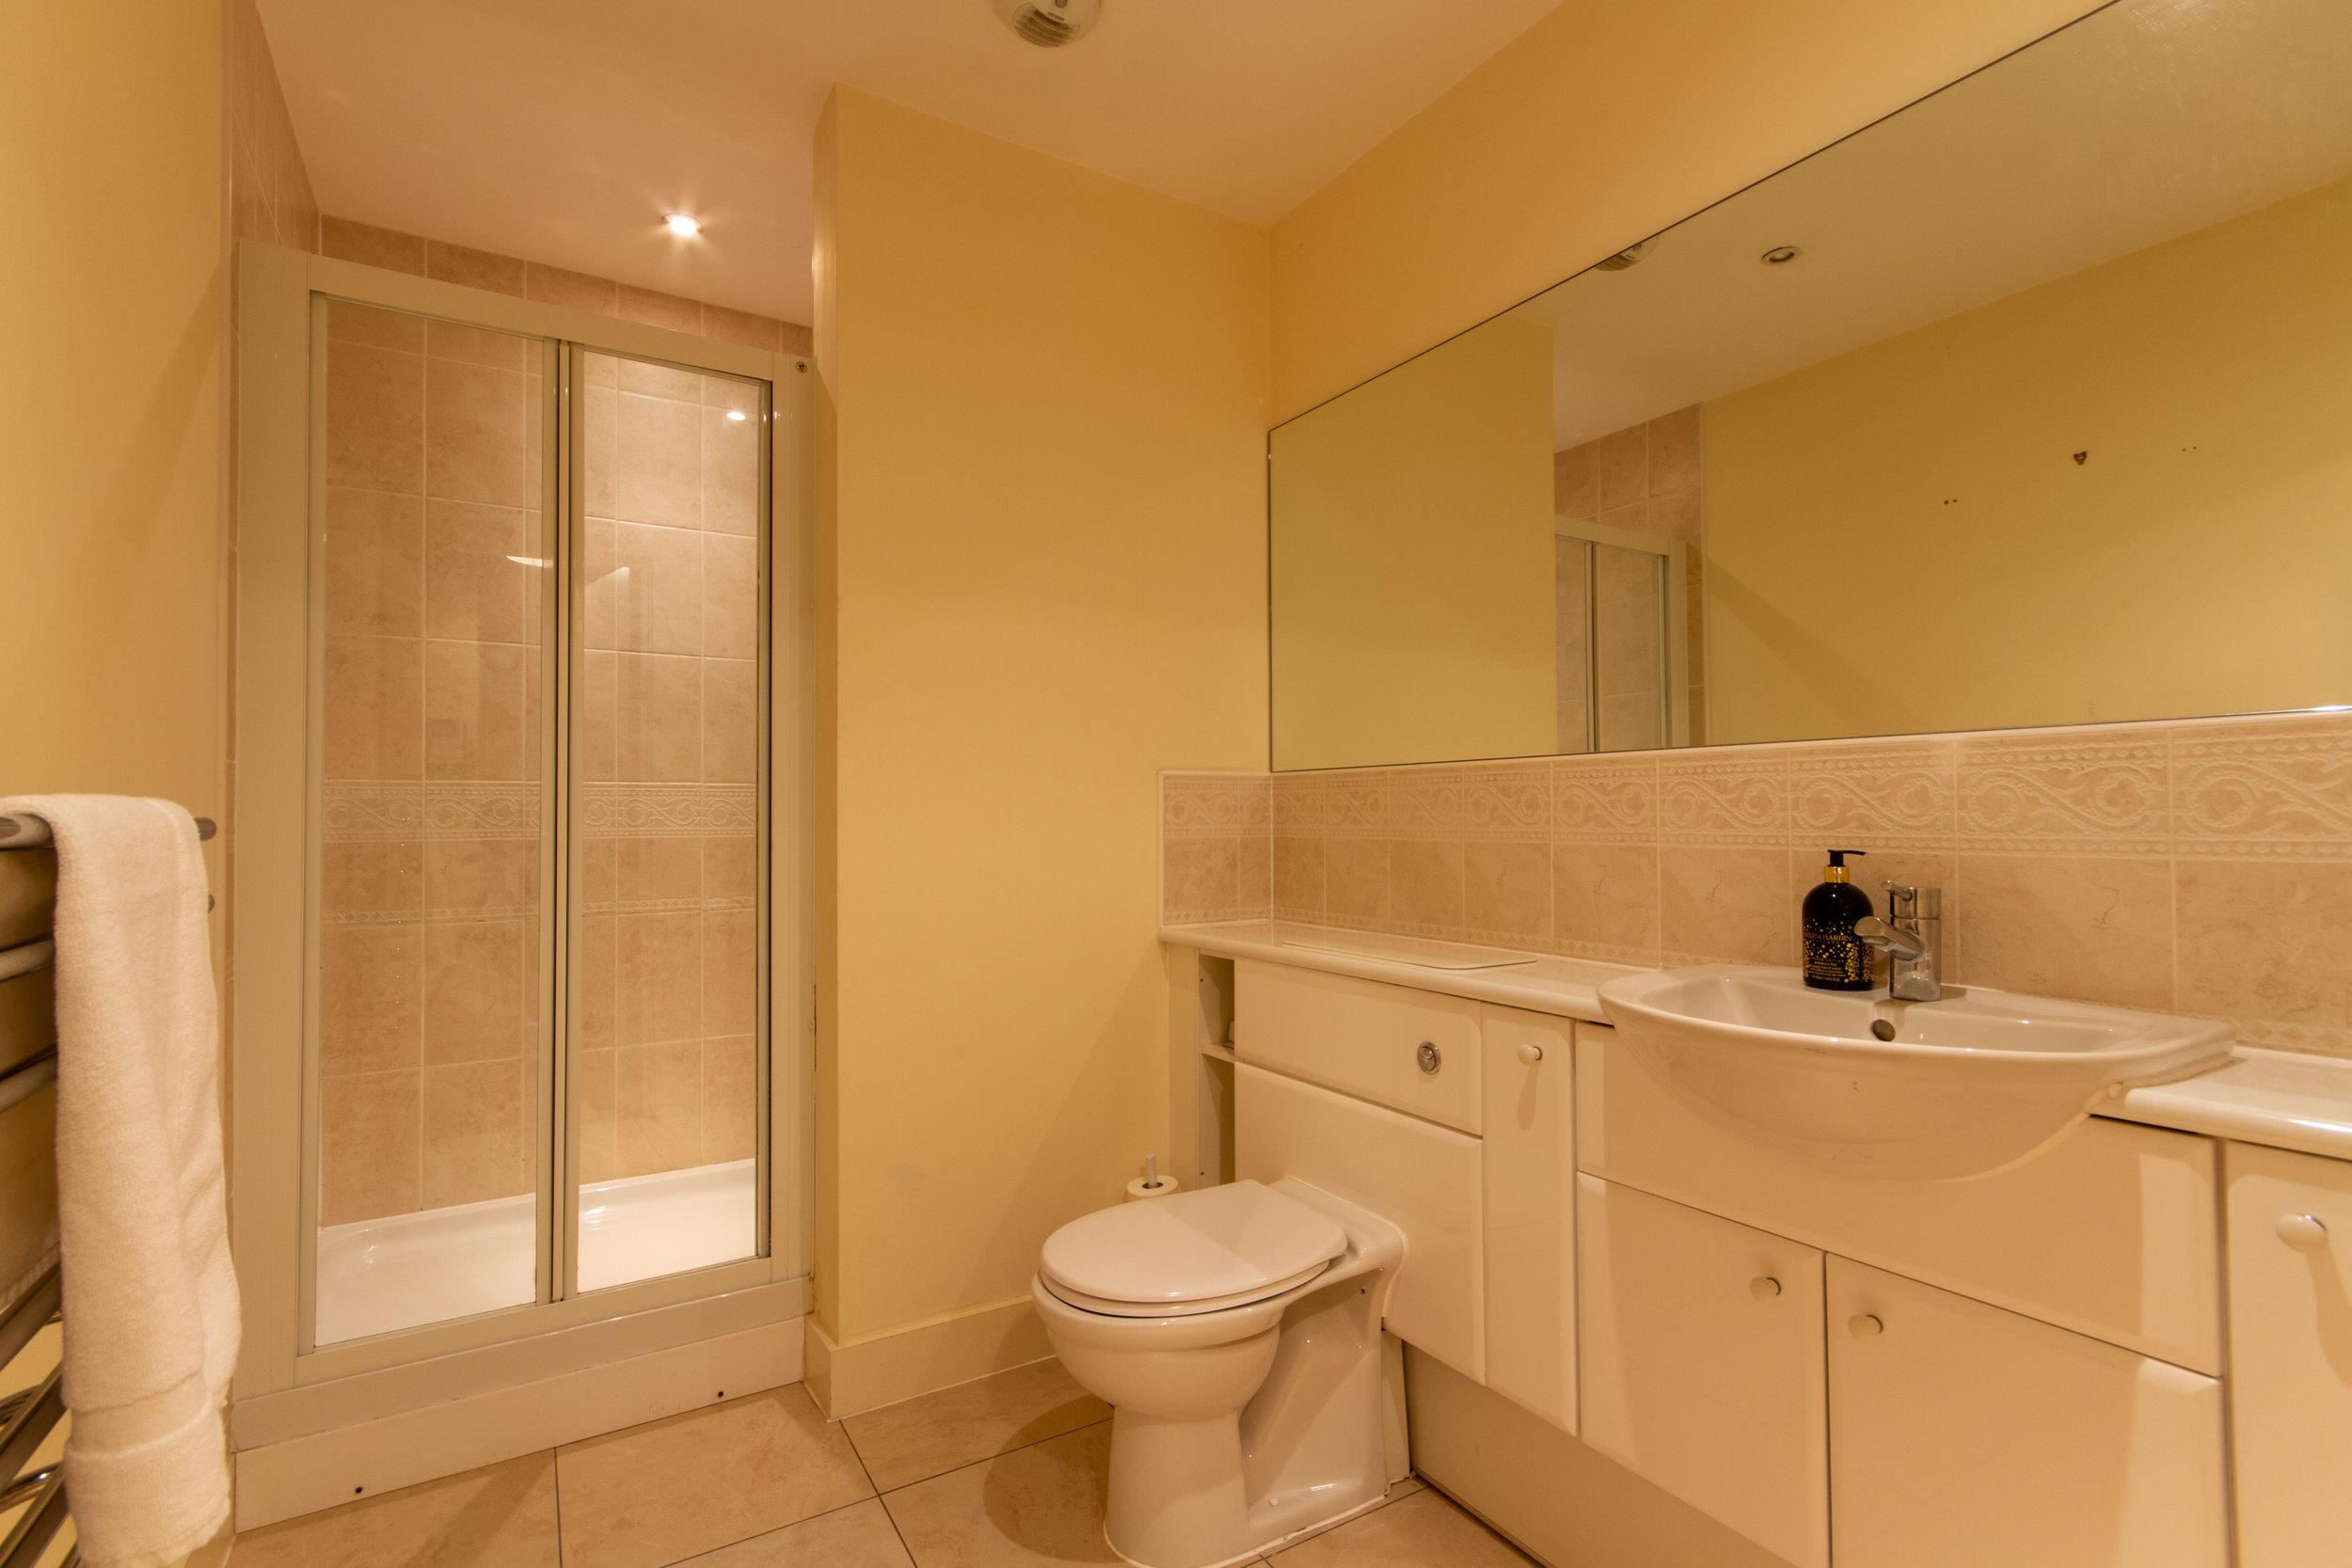 bathroom16mso.jpg